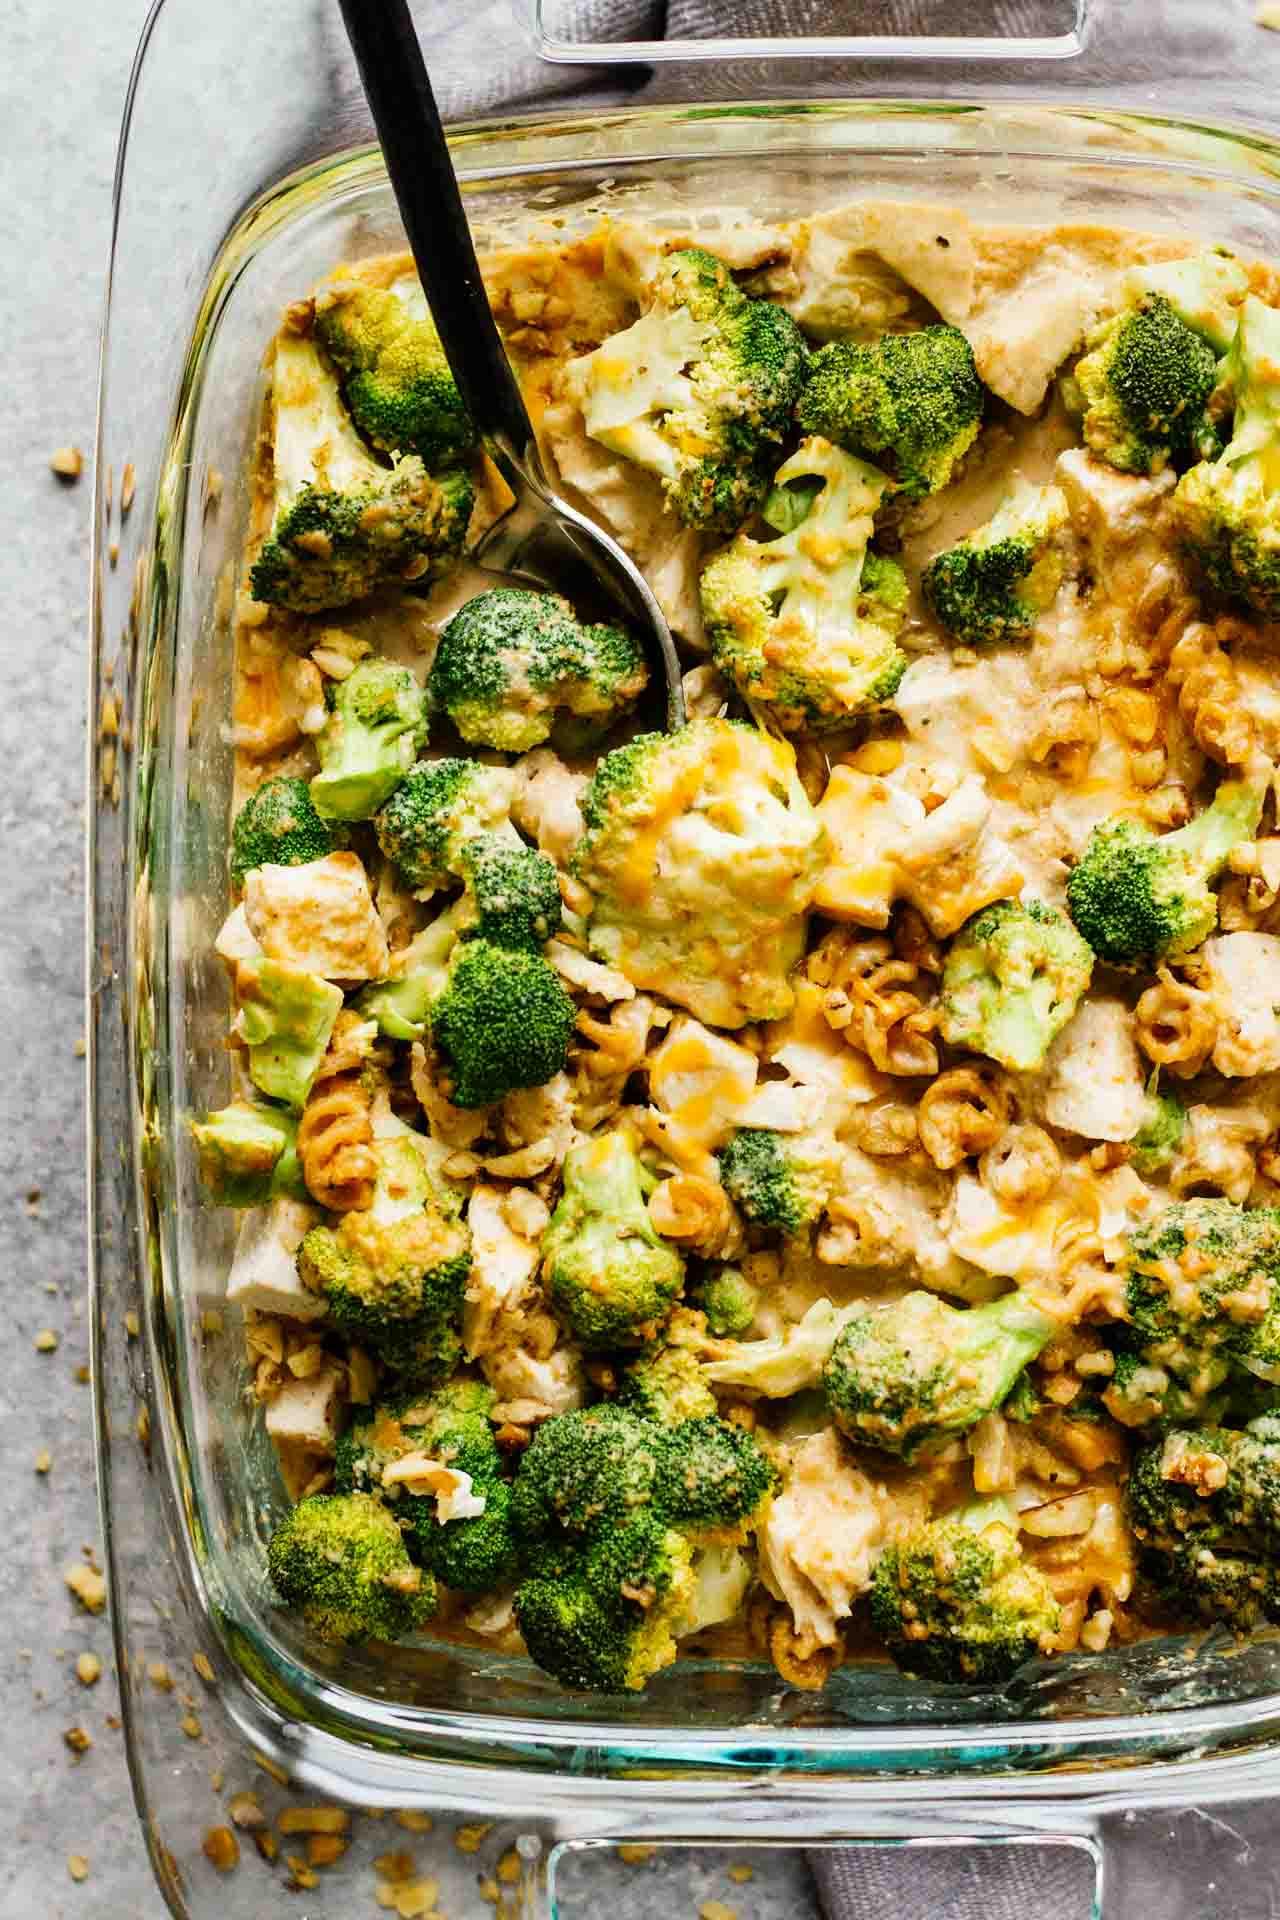 Healthy Chicken And Broccoli Casserole Recipes  Healthy Chicken Broccoli Pasta Casserole Jar Lemons